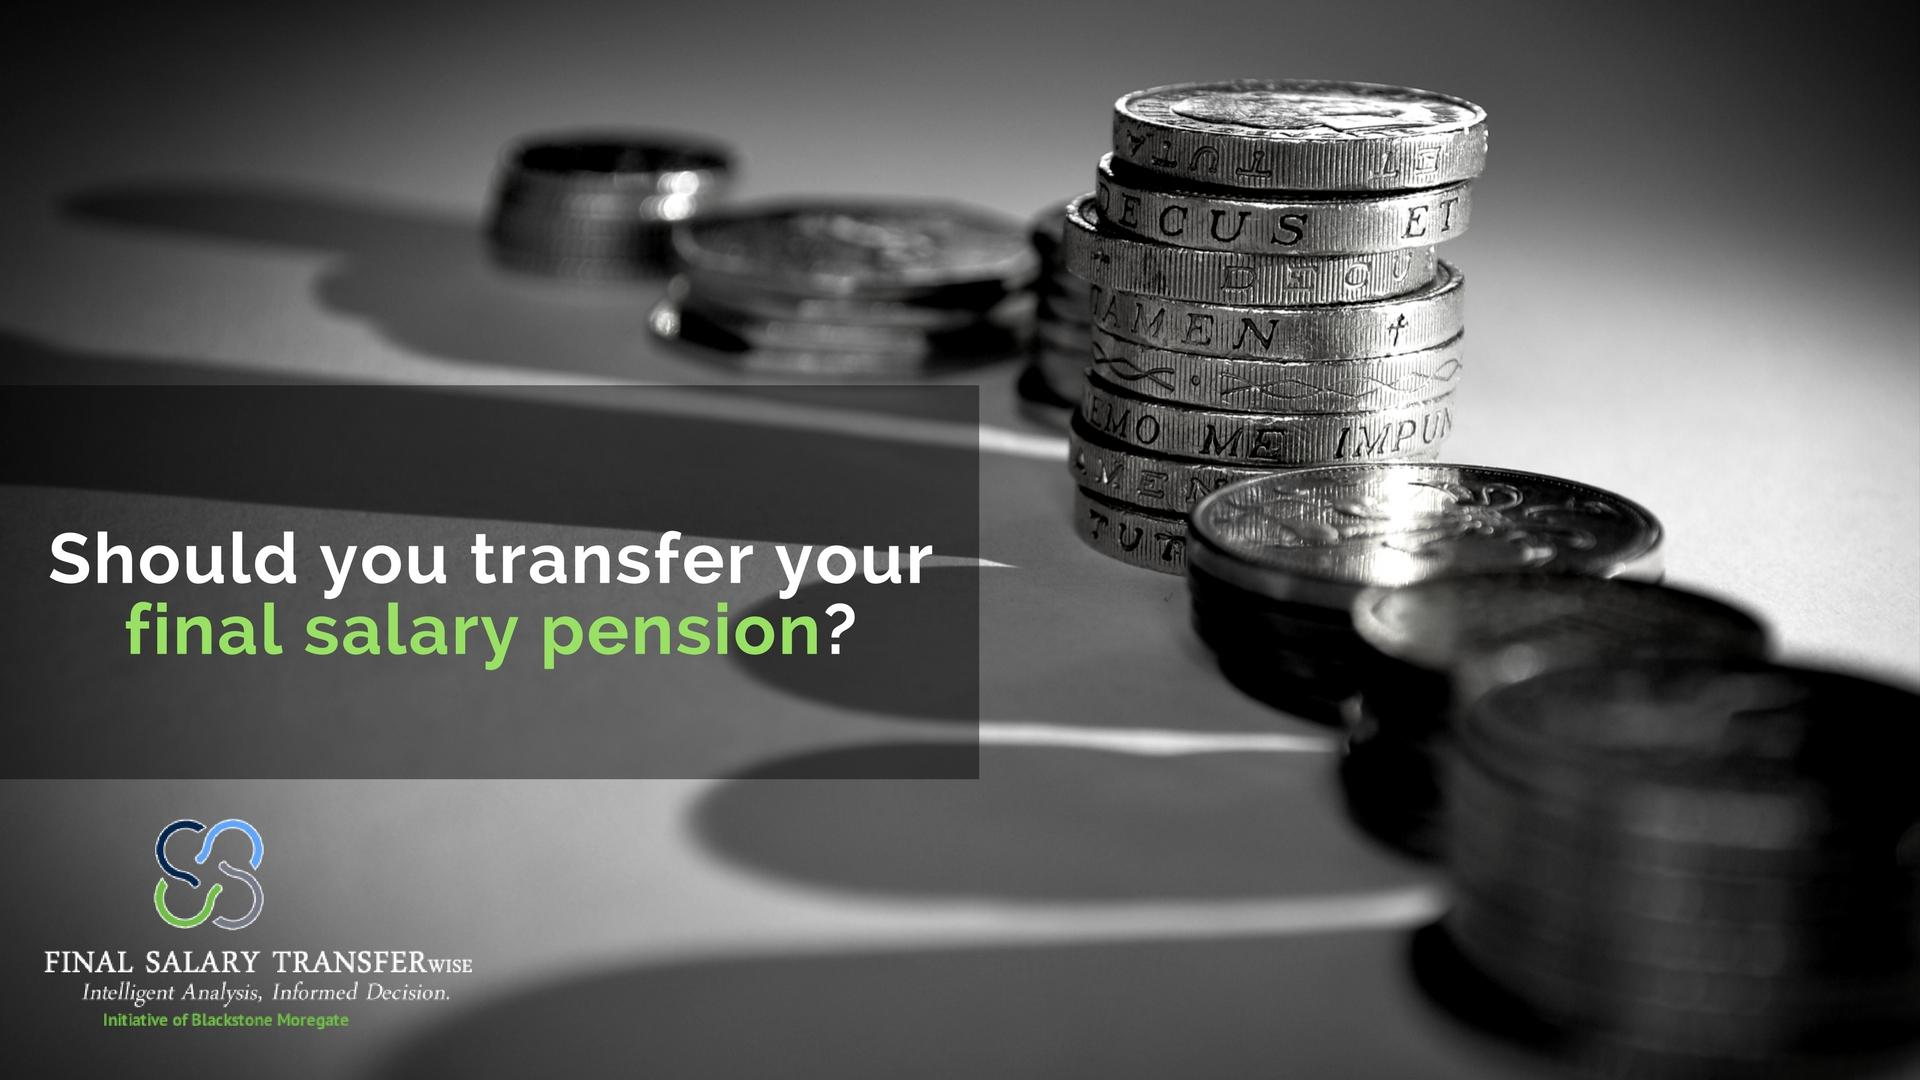 FInal_Salary_Transfer_Advice